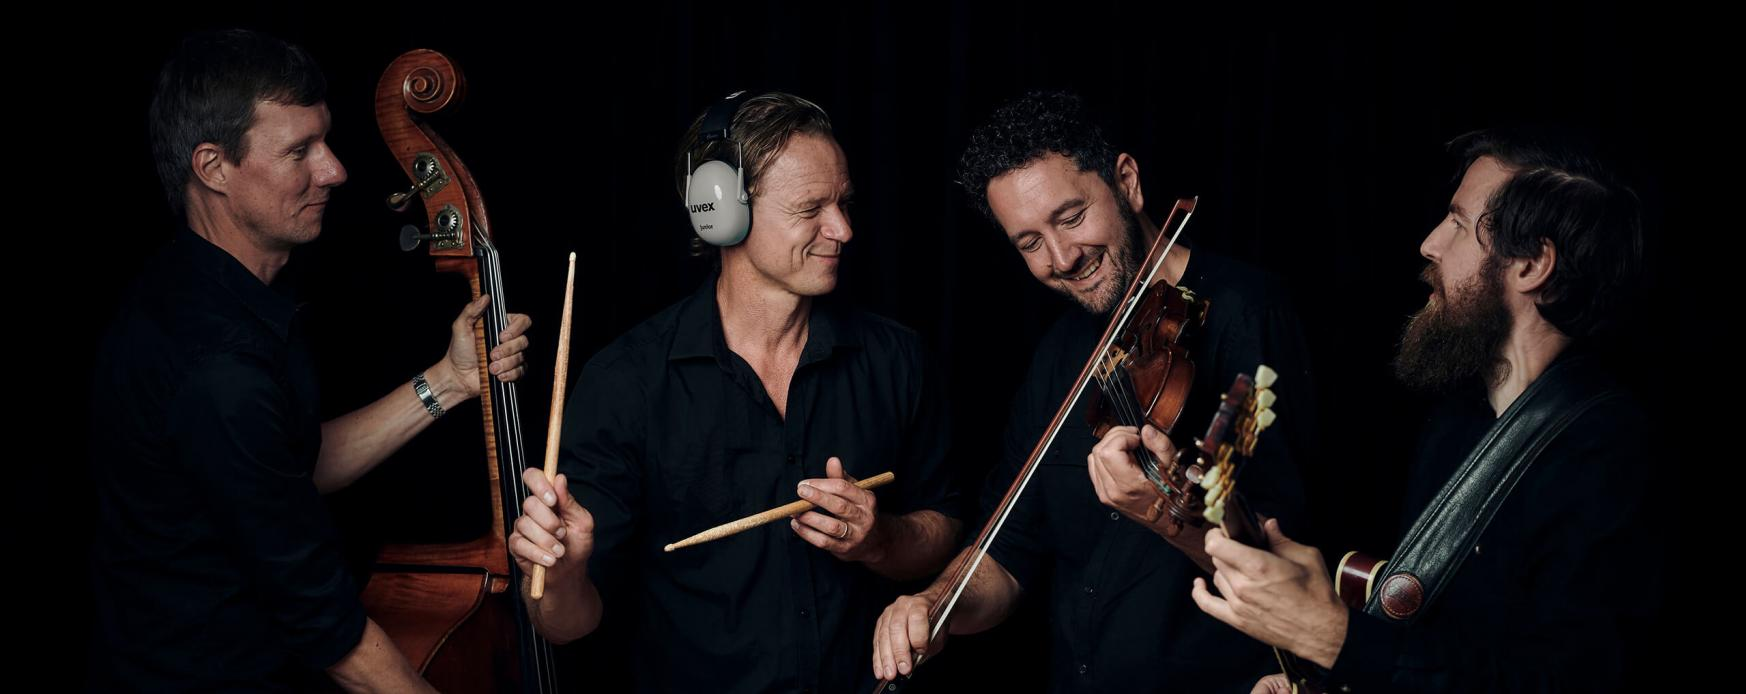 Stream on nipalive.ax with Bjarke Falgren